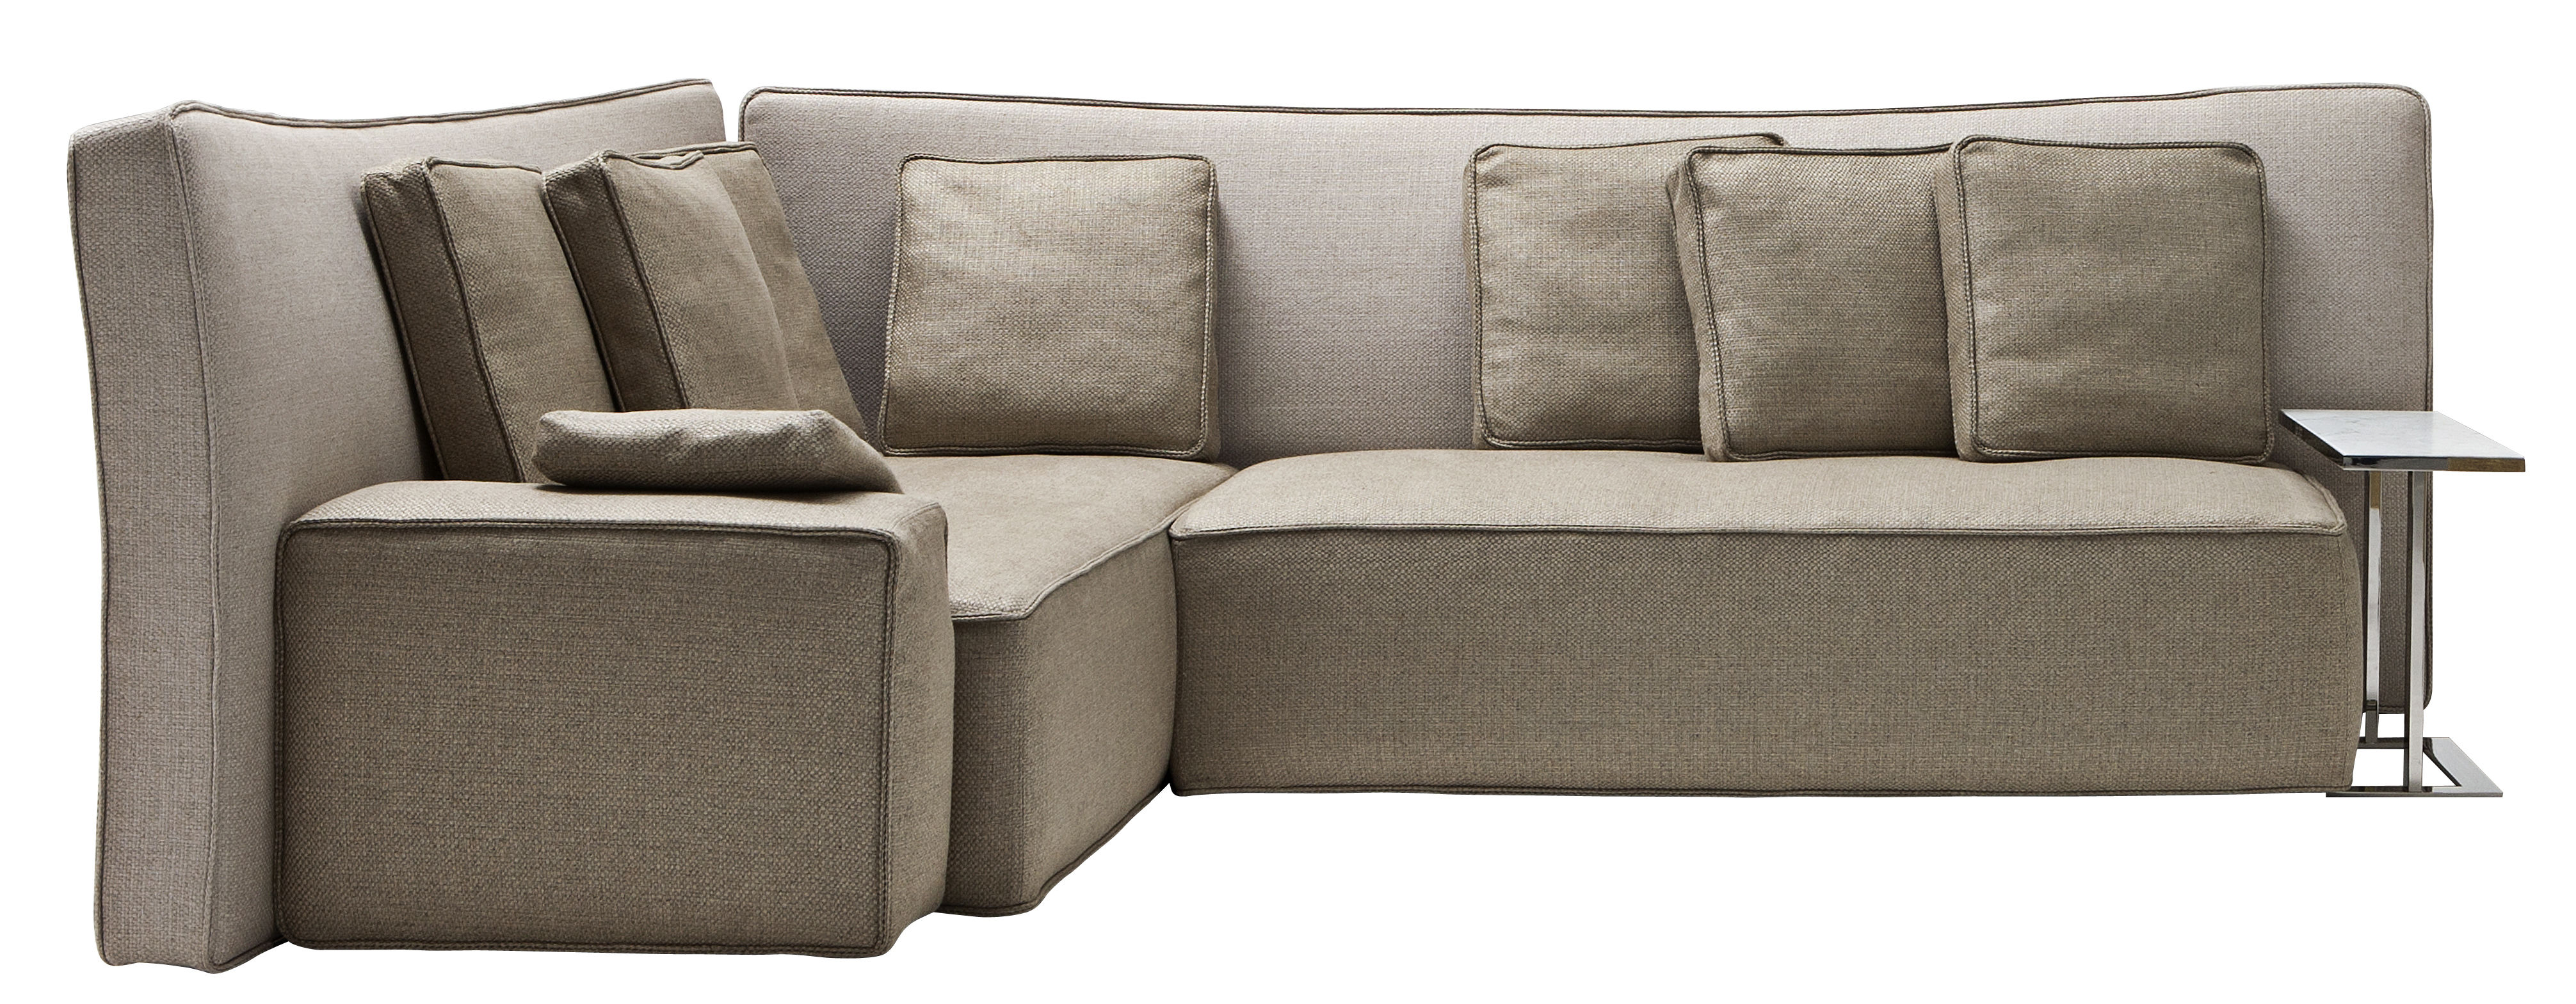 Furniture Sofas Wow Sofa Corner L 289 Cm X P 230